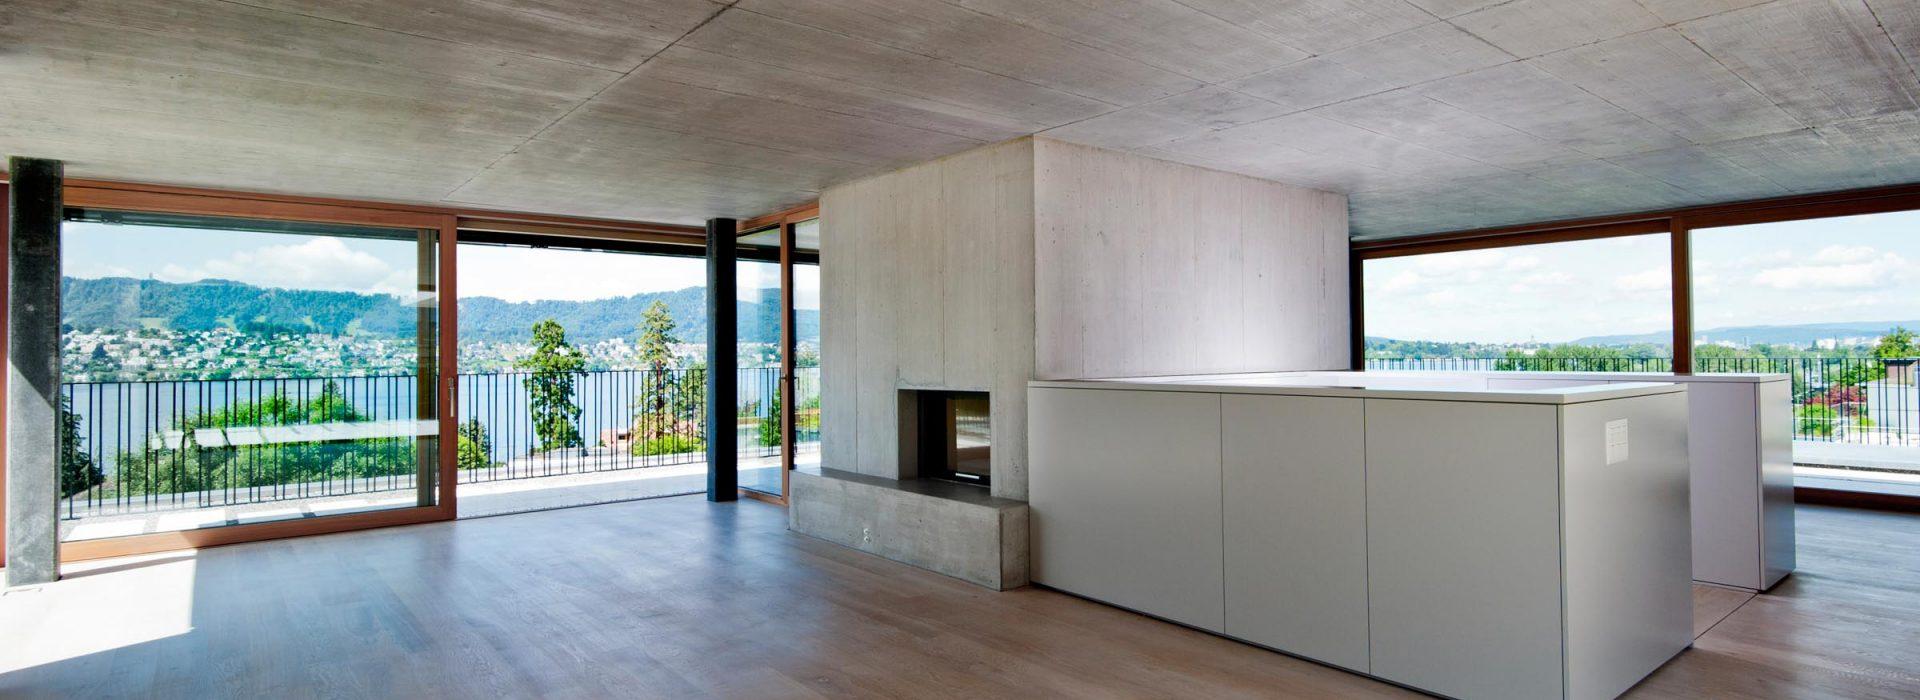 Architekturfotograf-Innenraumaufnahme-Attikawohnung-fotograf-spitz